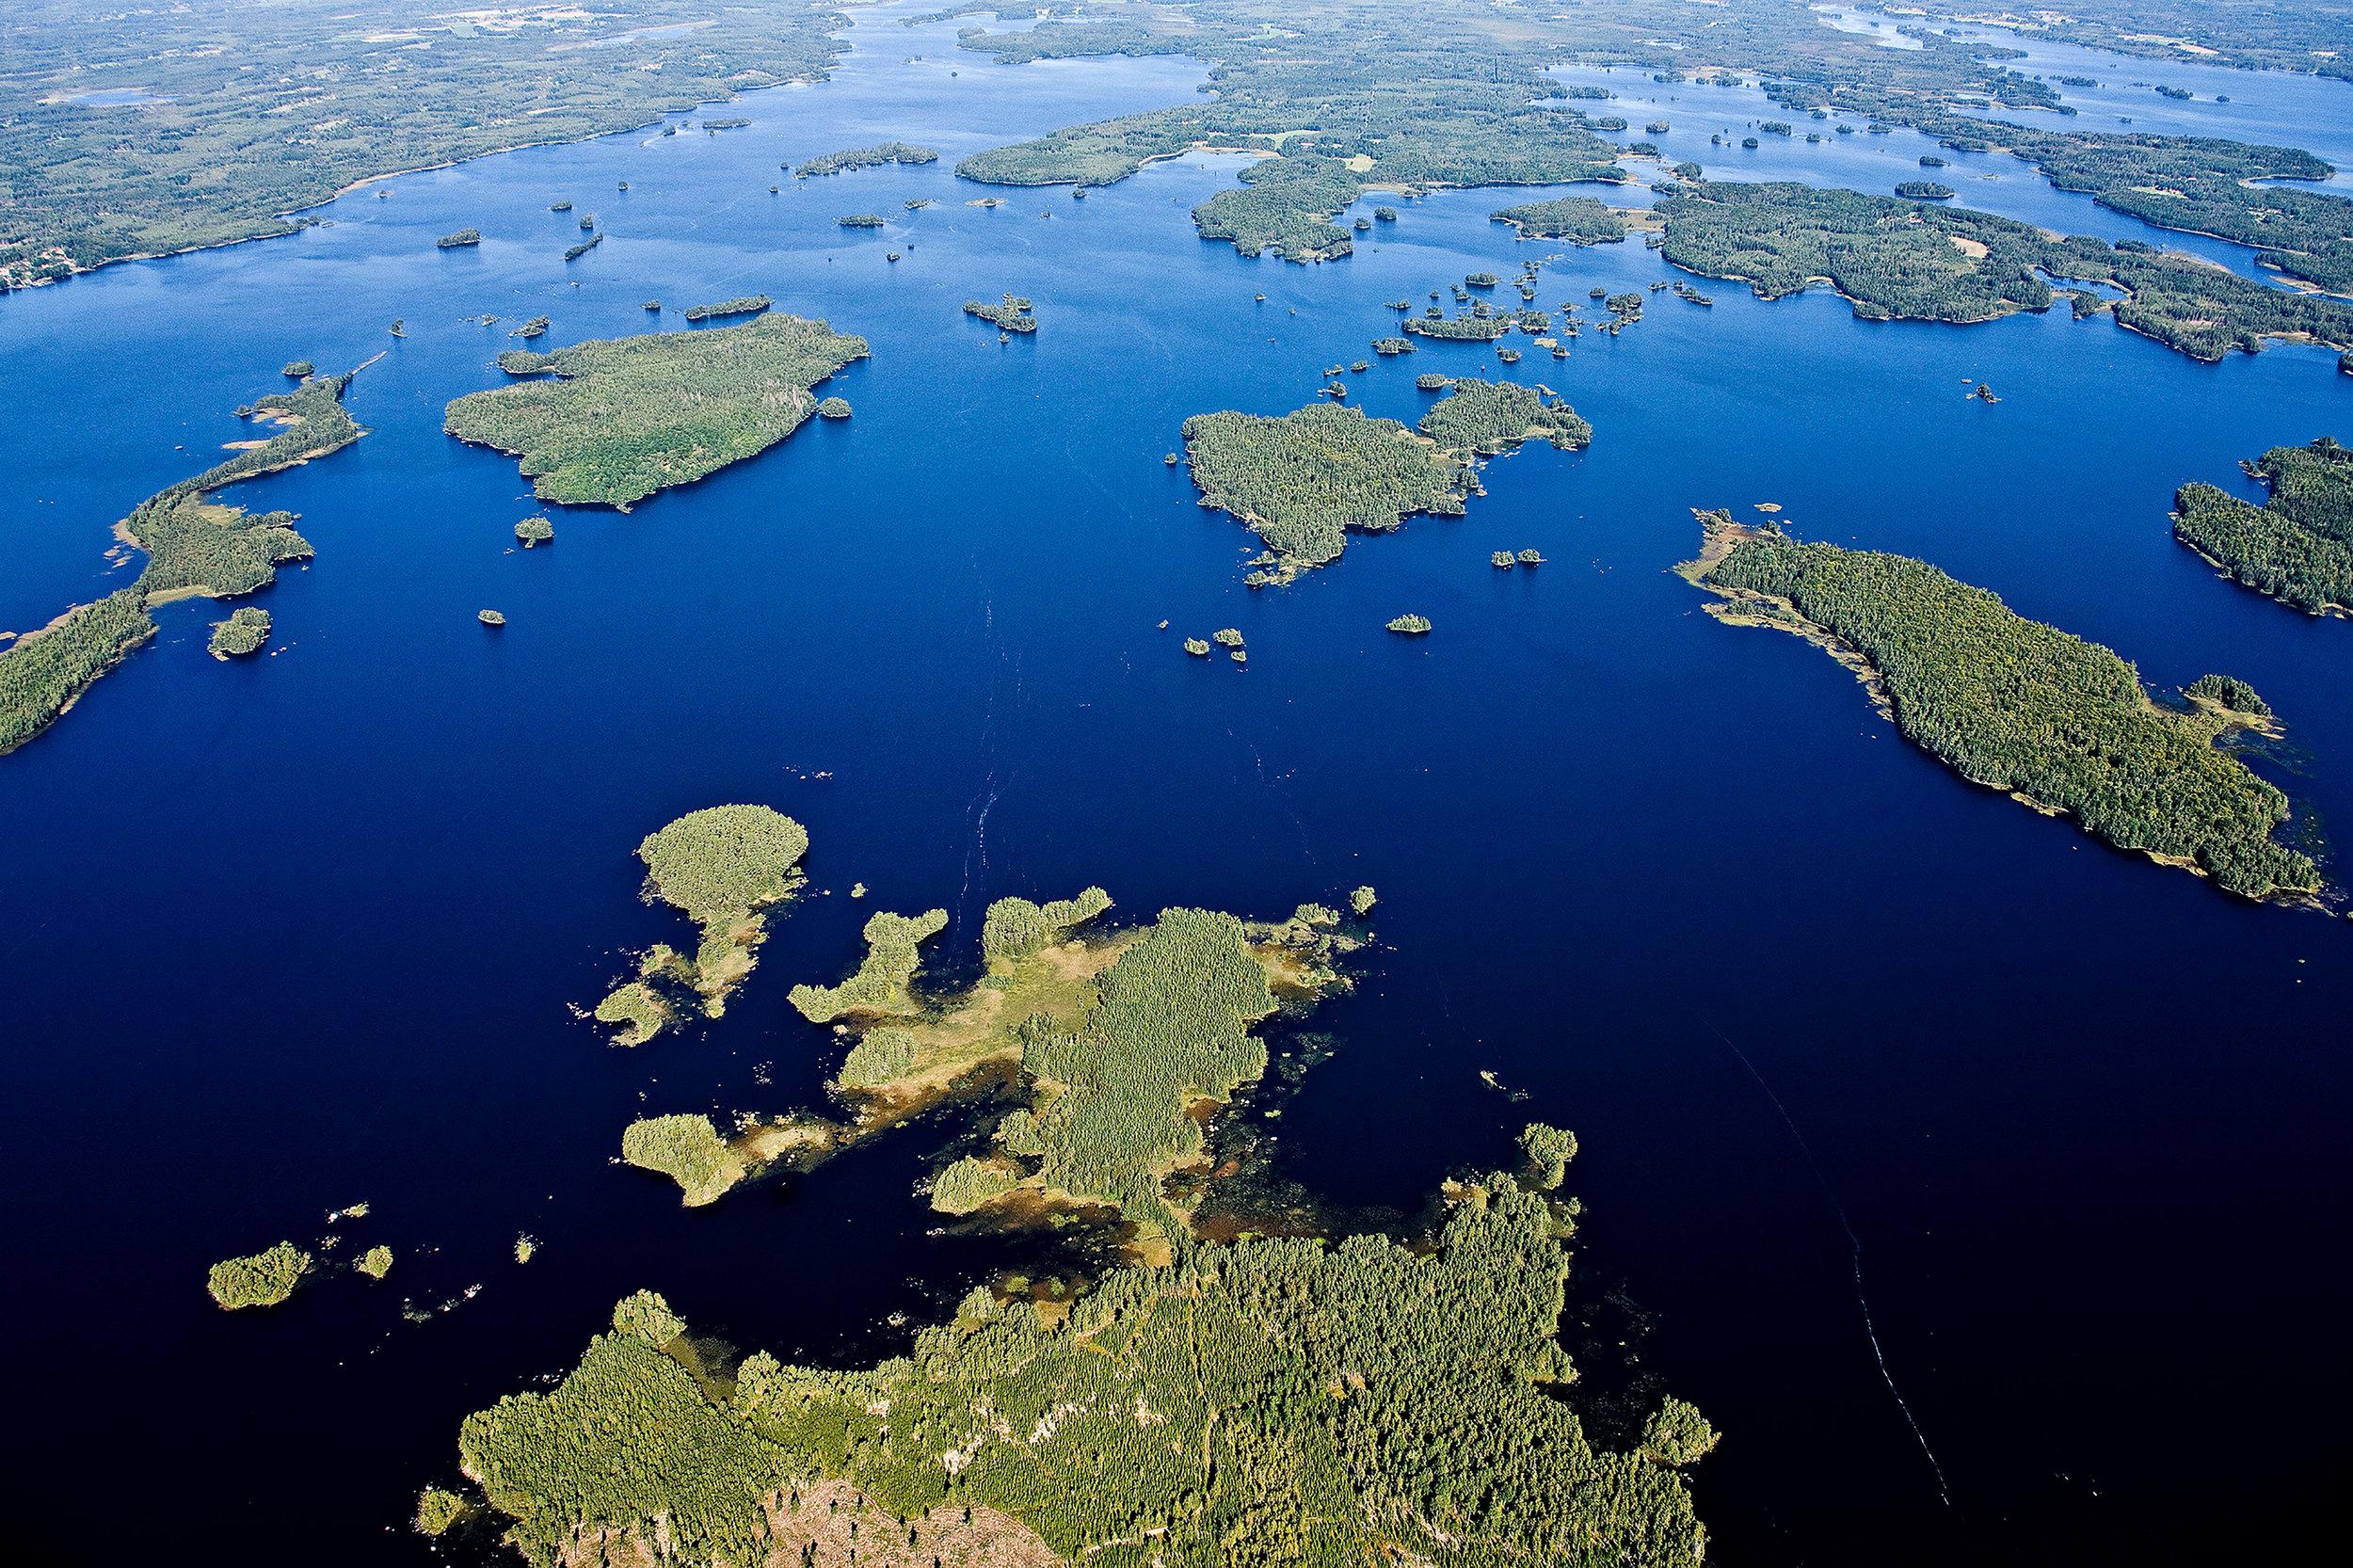 Åsnens nationalpark - 75% vatten